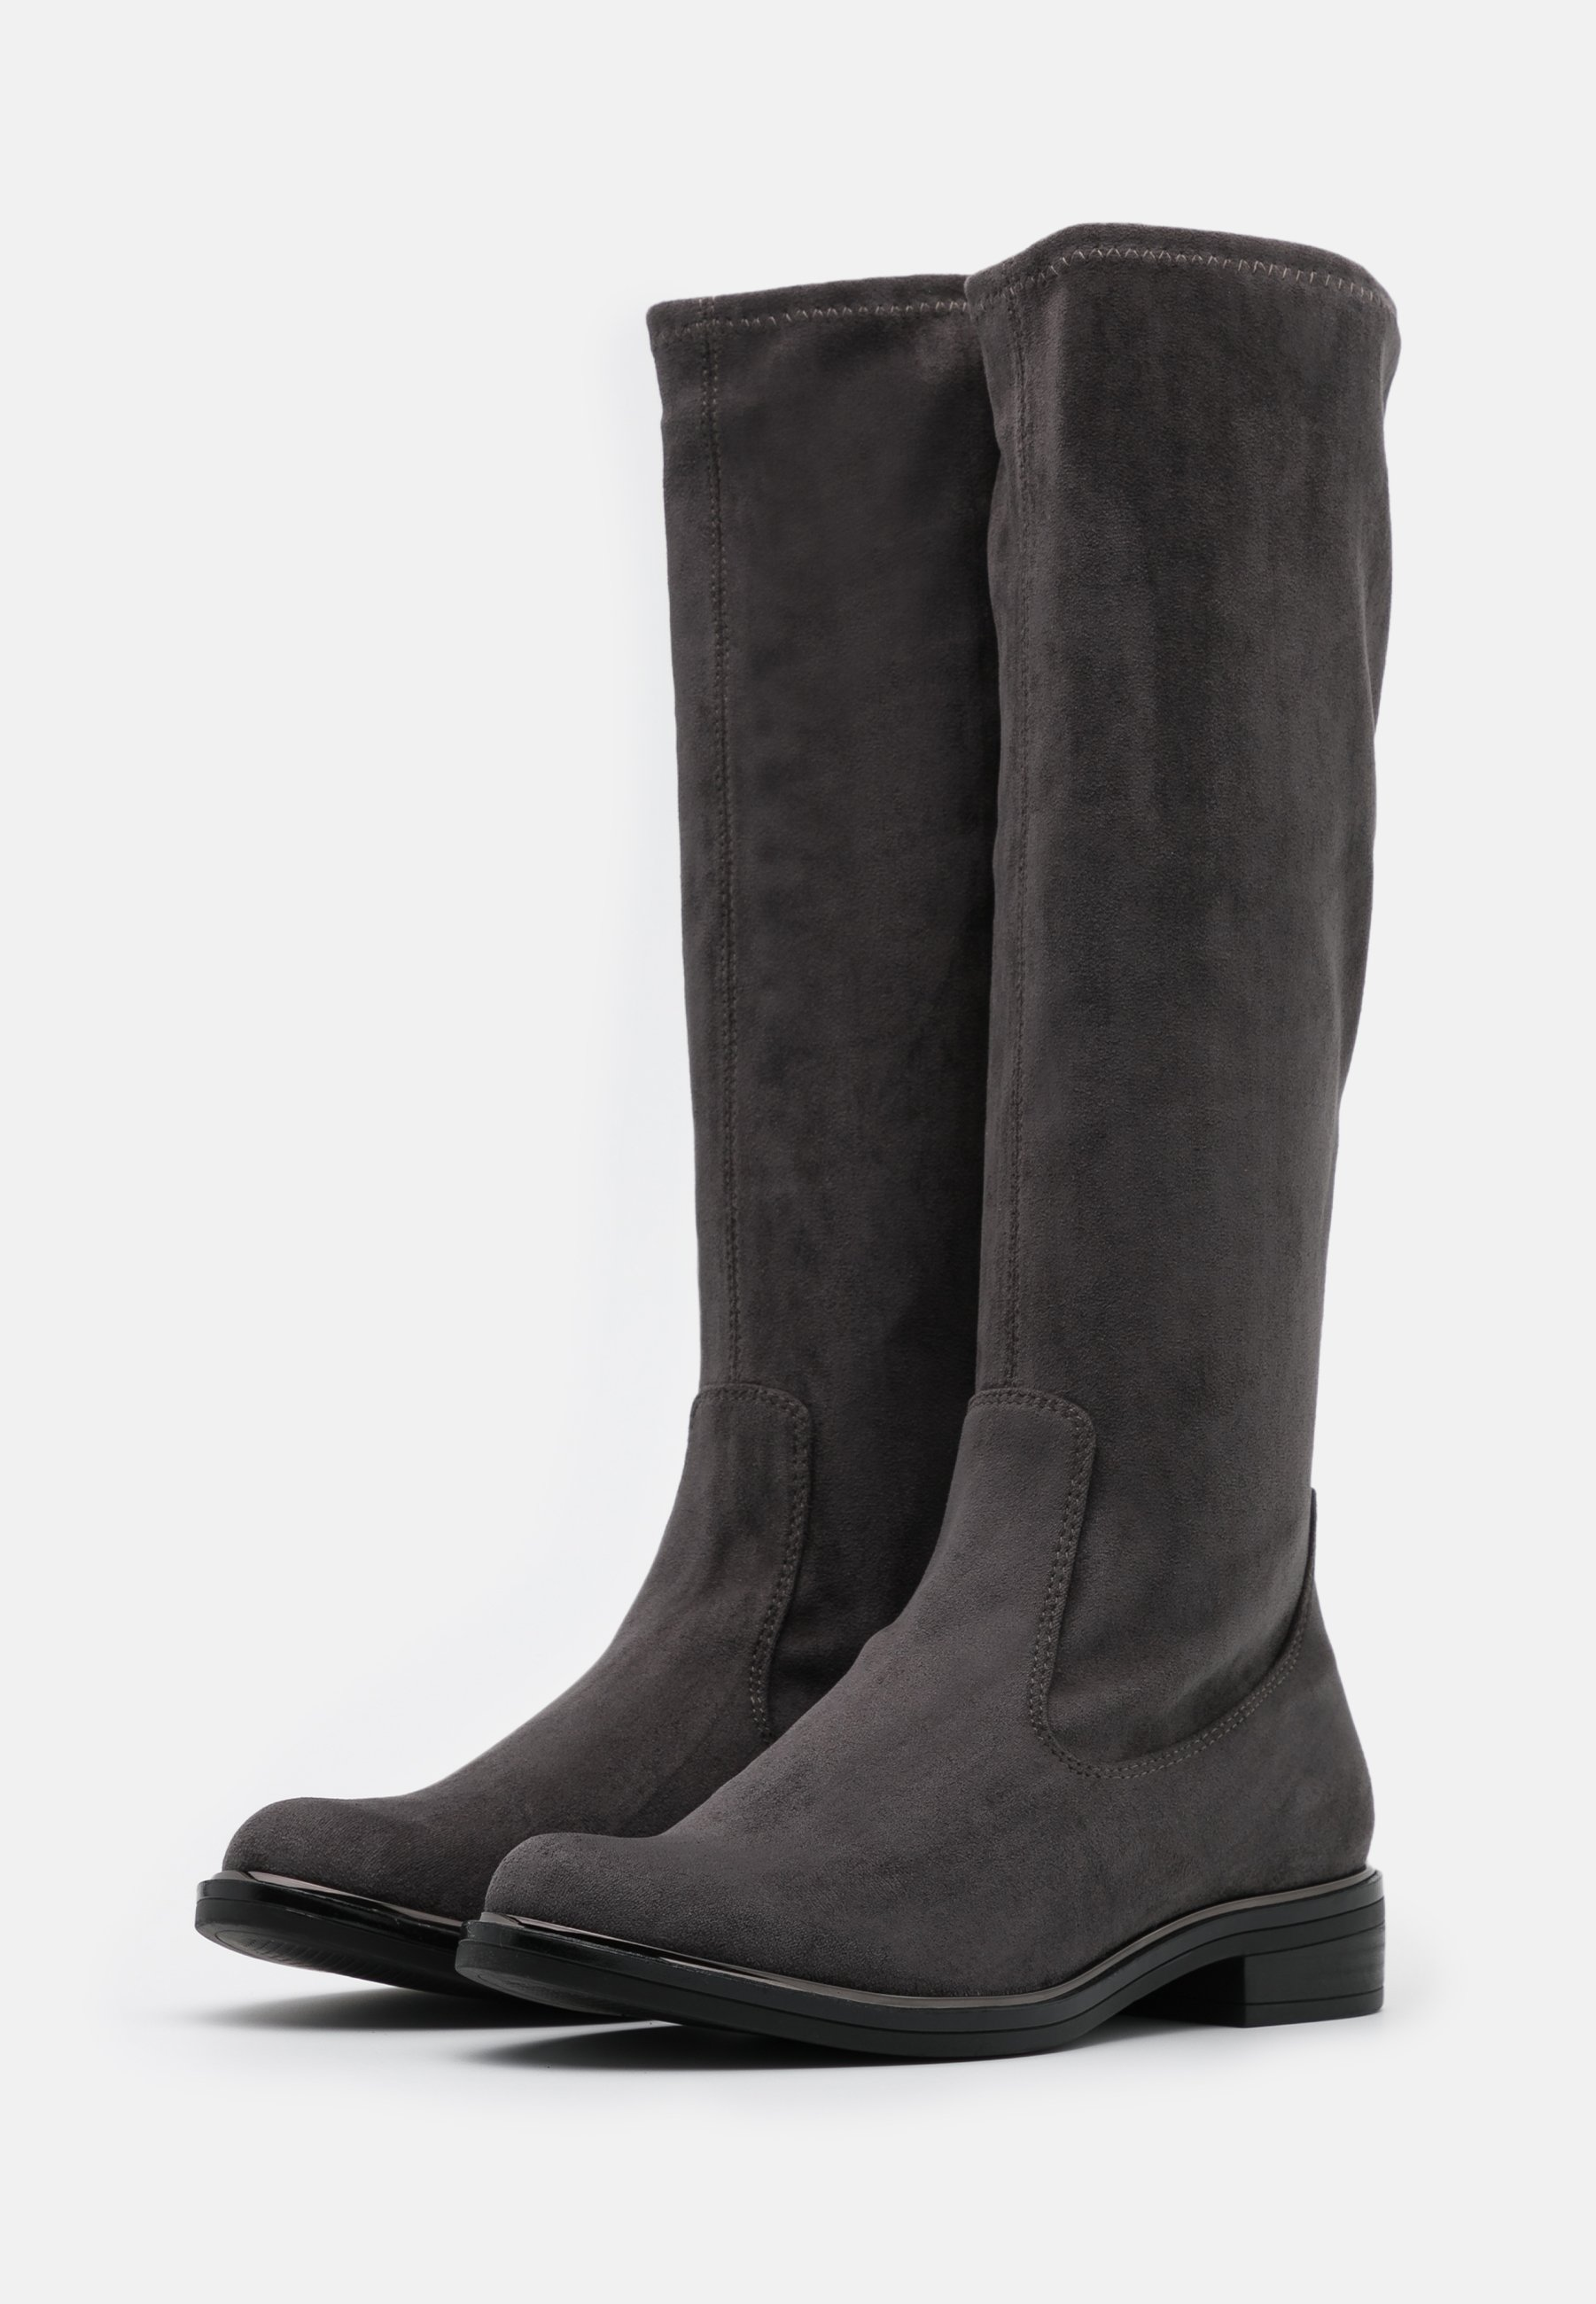 Caprice BOOTS Stiefel dark grey/dunkelgrau